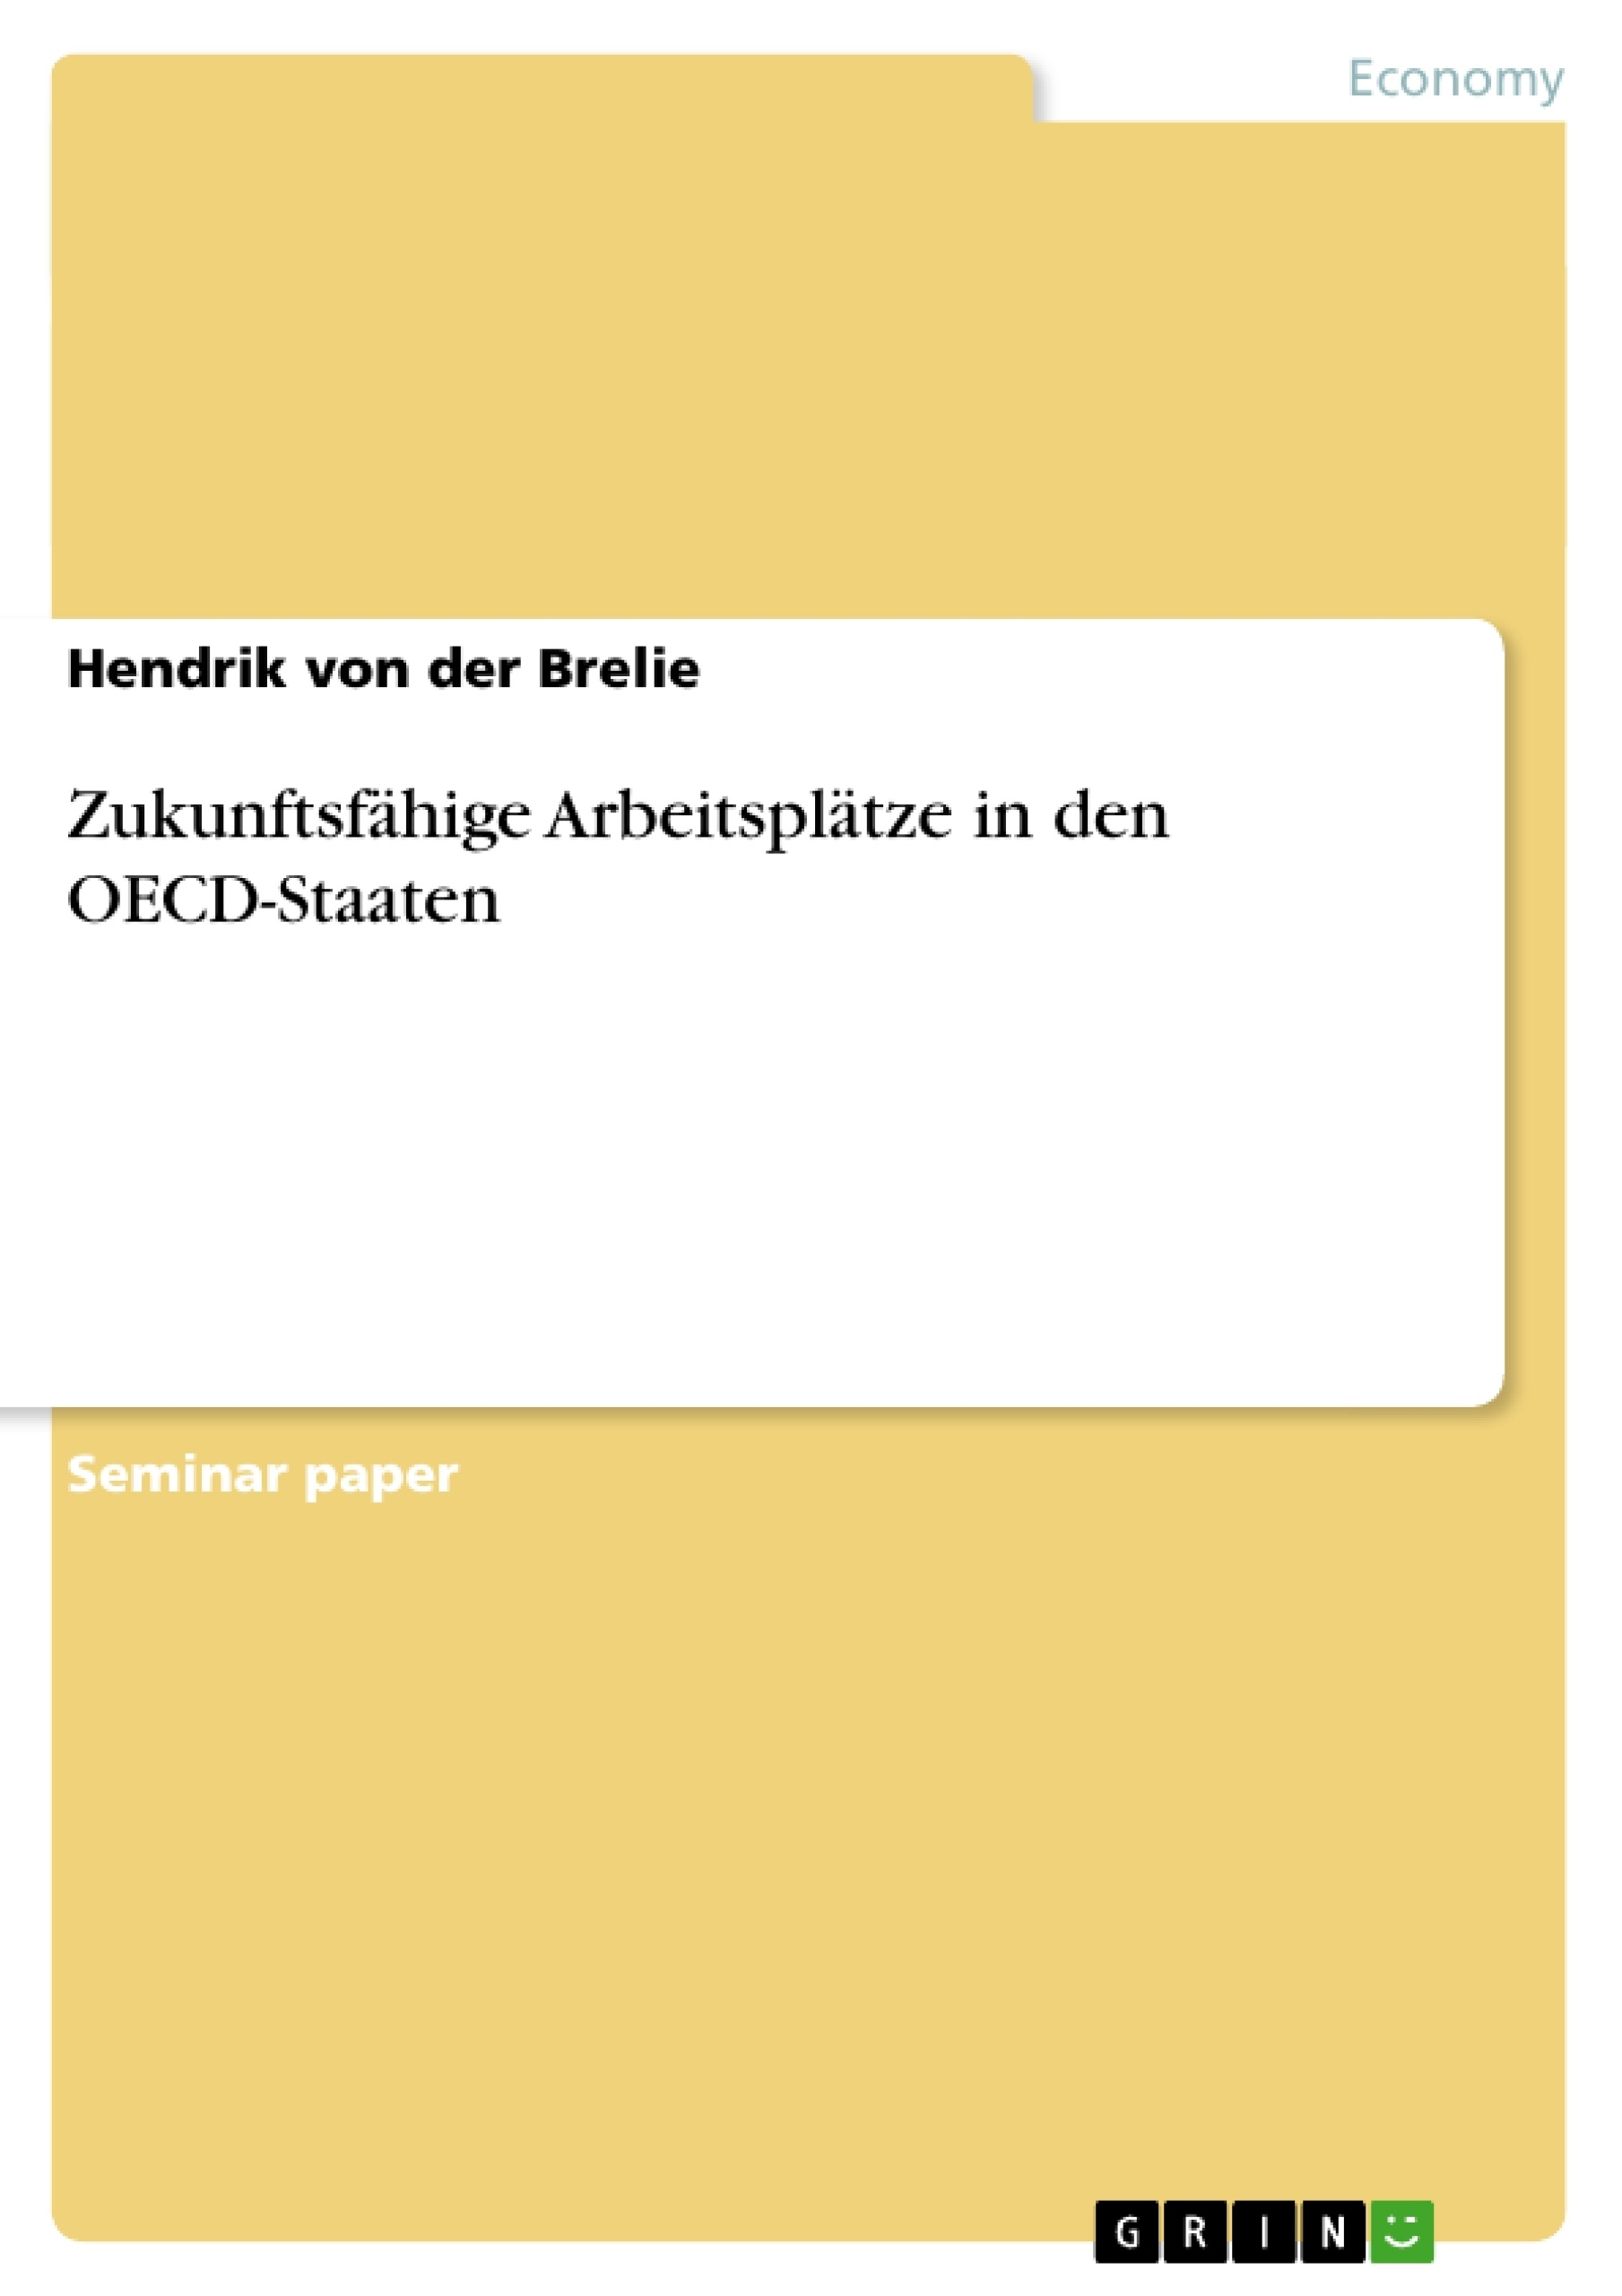 Title: Zukunftsfähige Arbeitsplätze in den OECD-Staaten